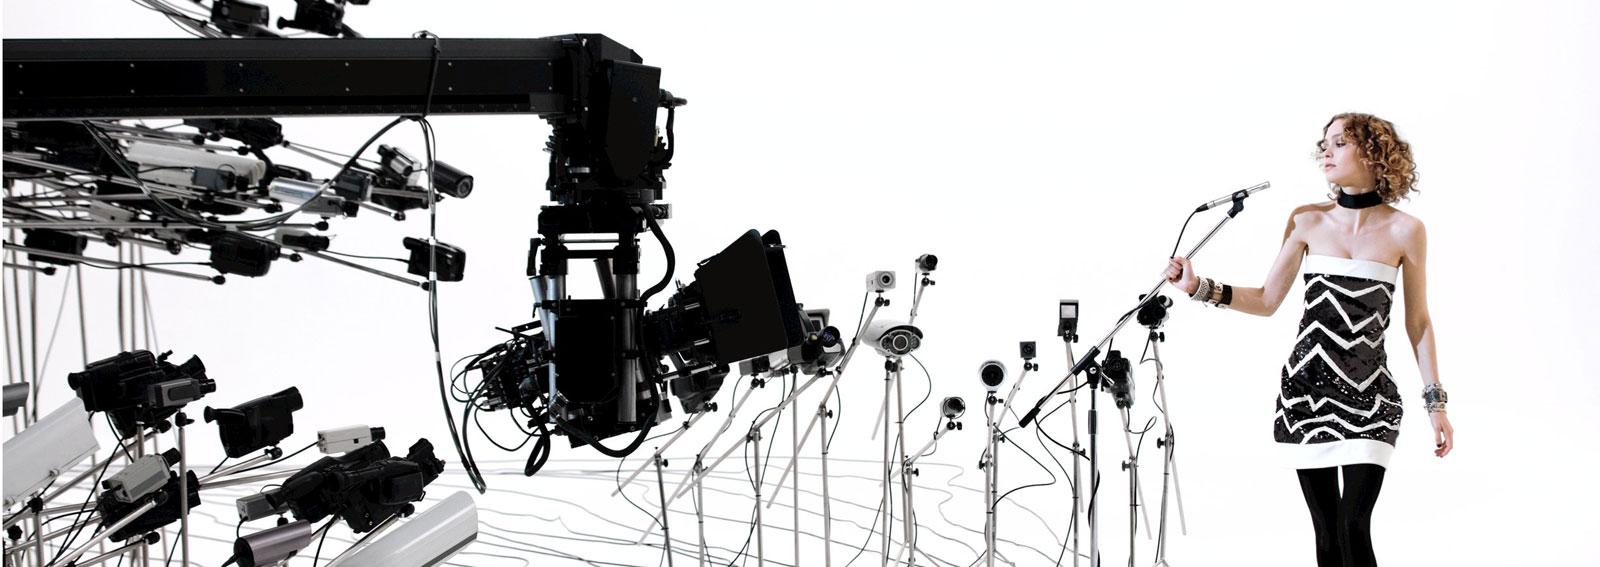 film-chanel-n-5-l-eau-desktop